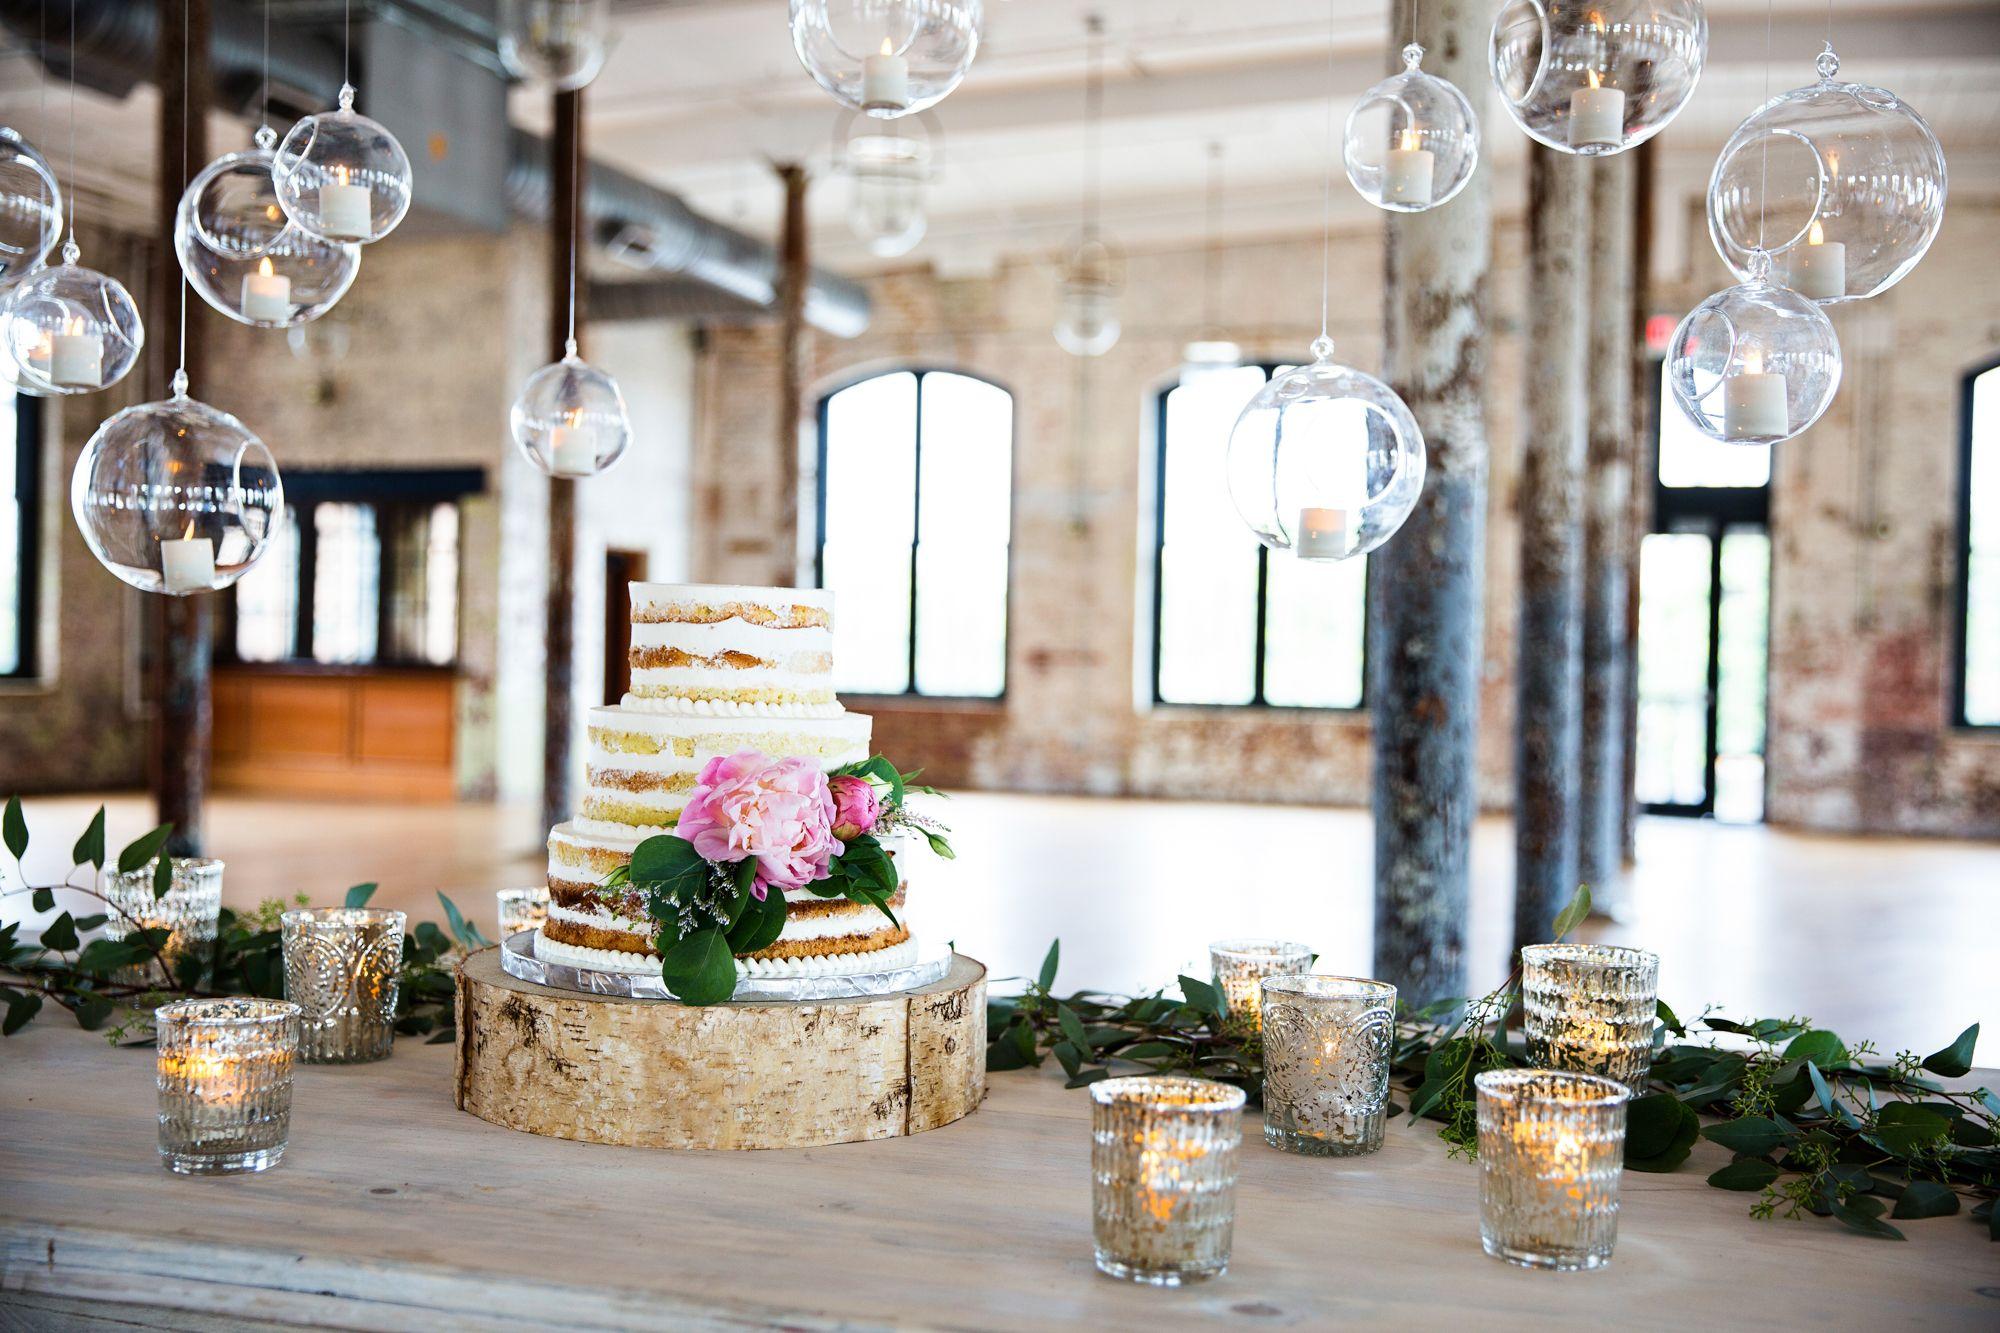 Graham L Ervin Cedar room Charleston sc wedding venues